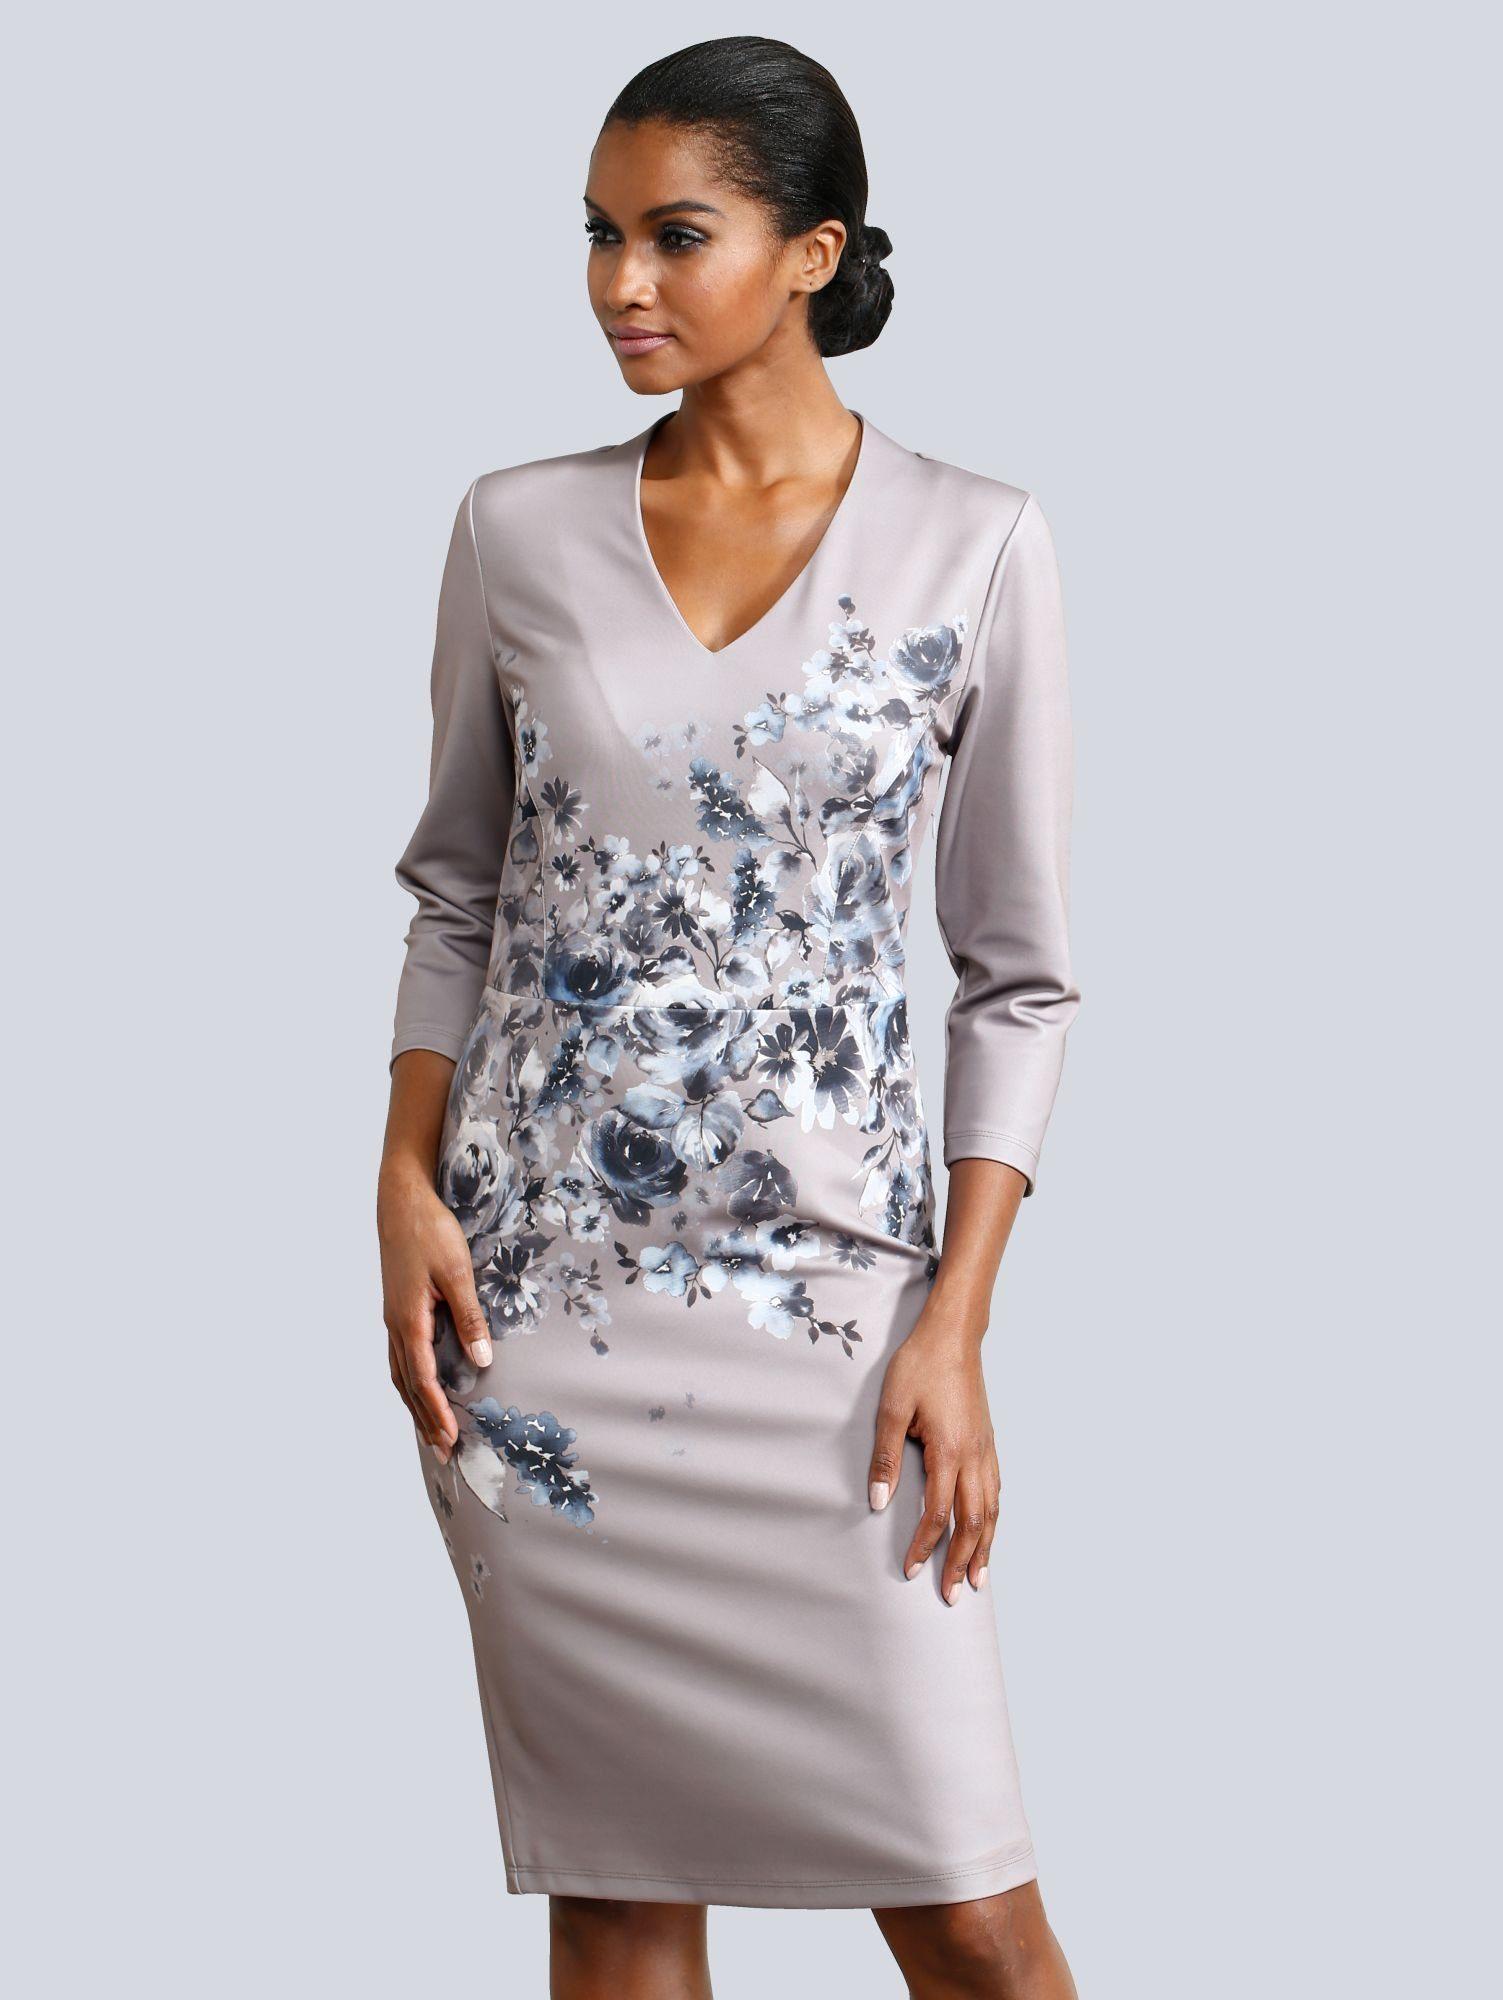 Alba Moda Kleid plakativer Blumendruck